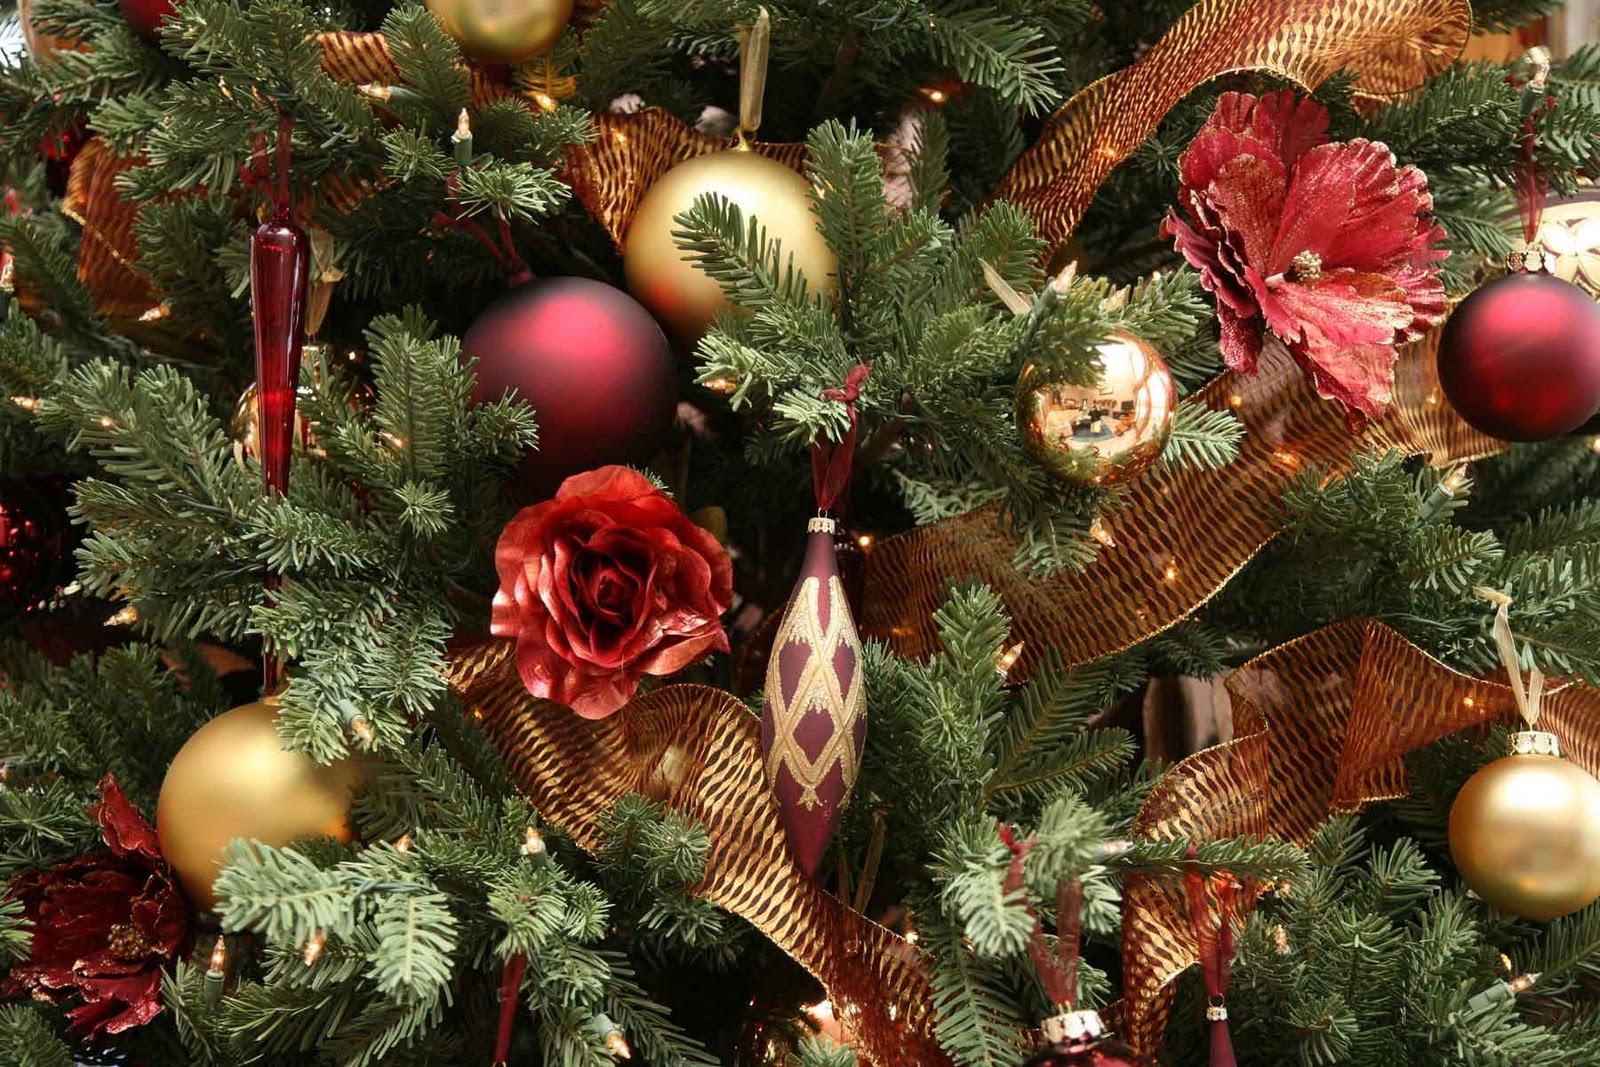 http://3.bp.blogspot.com/-OW5G_Vmv_2Q/Ts1EAm_K3UI/AAAAAAAAAxA/tZ2lknc7tvo/s1600/free+christmas+greeting+cards.jpg